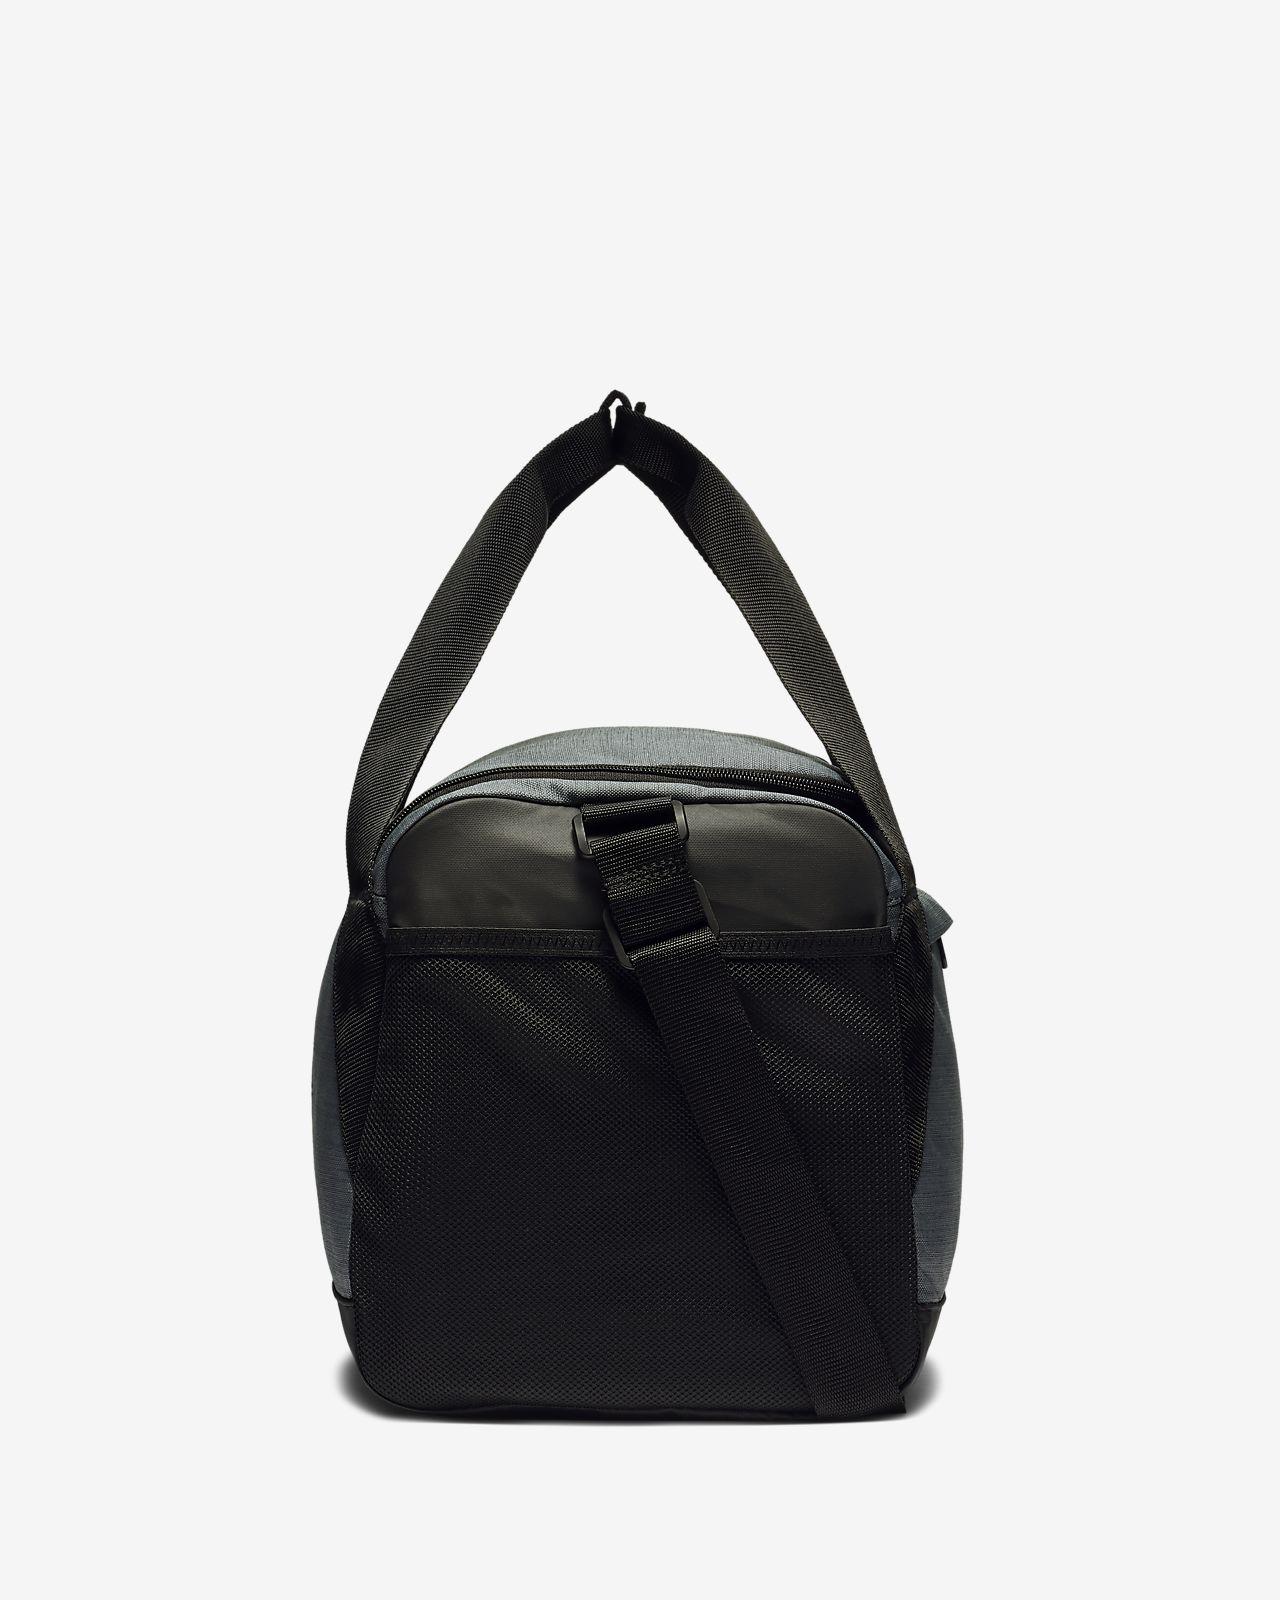 6746965ec7 Nike Brasilia Training Duffel Bag (Small). Nike.com